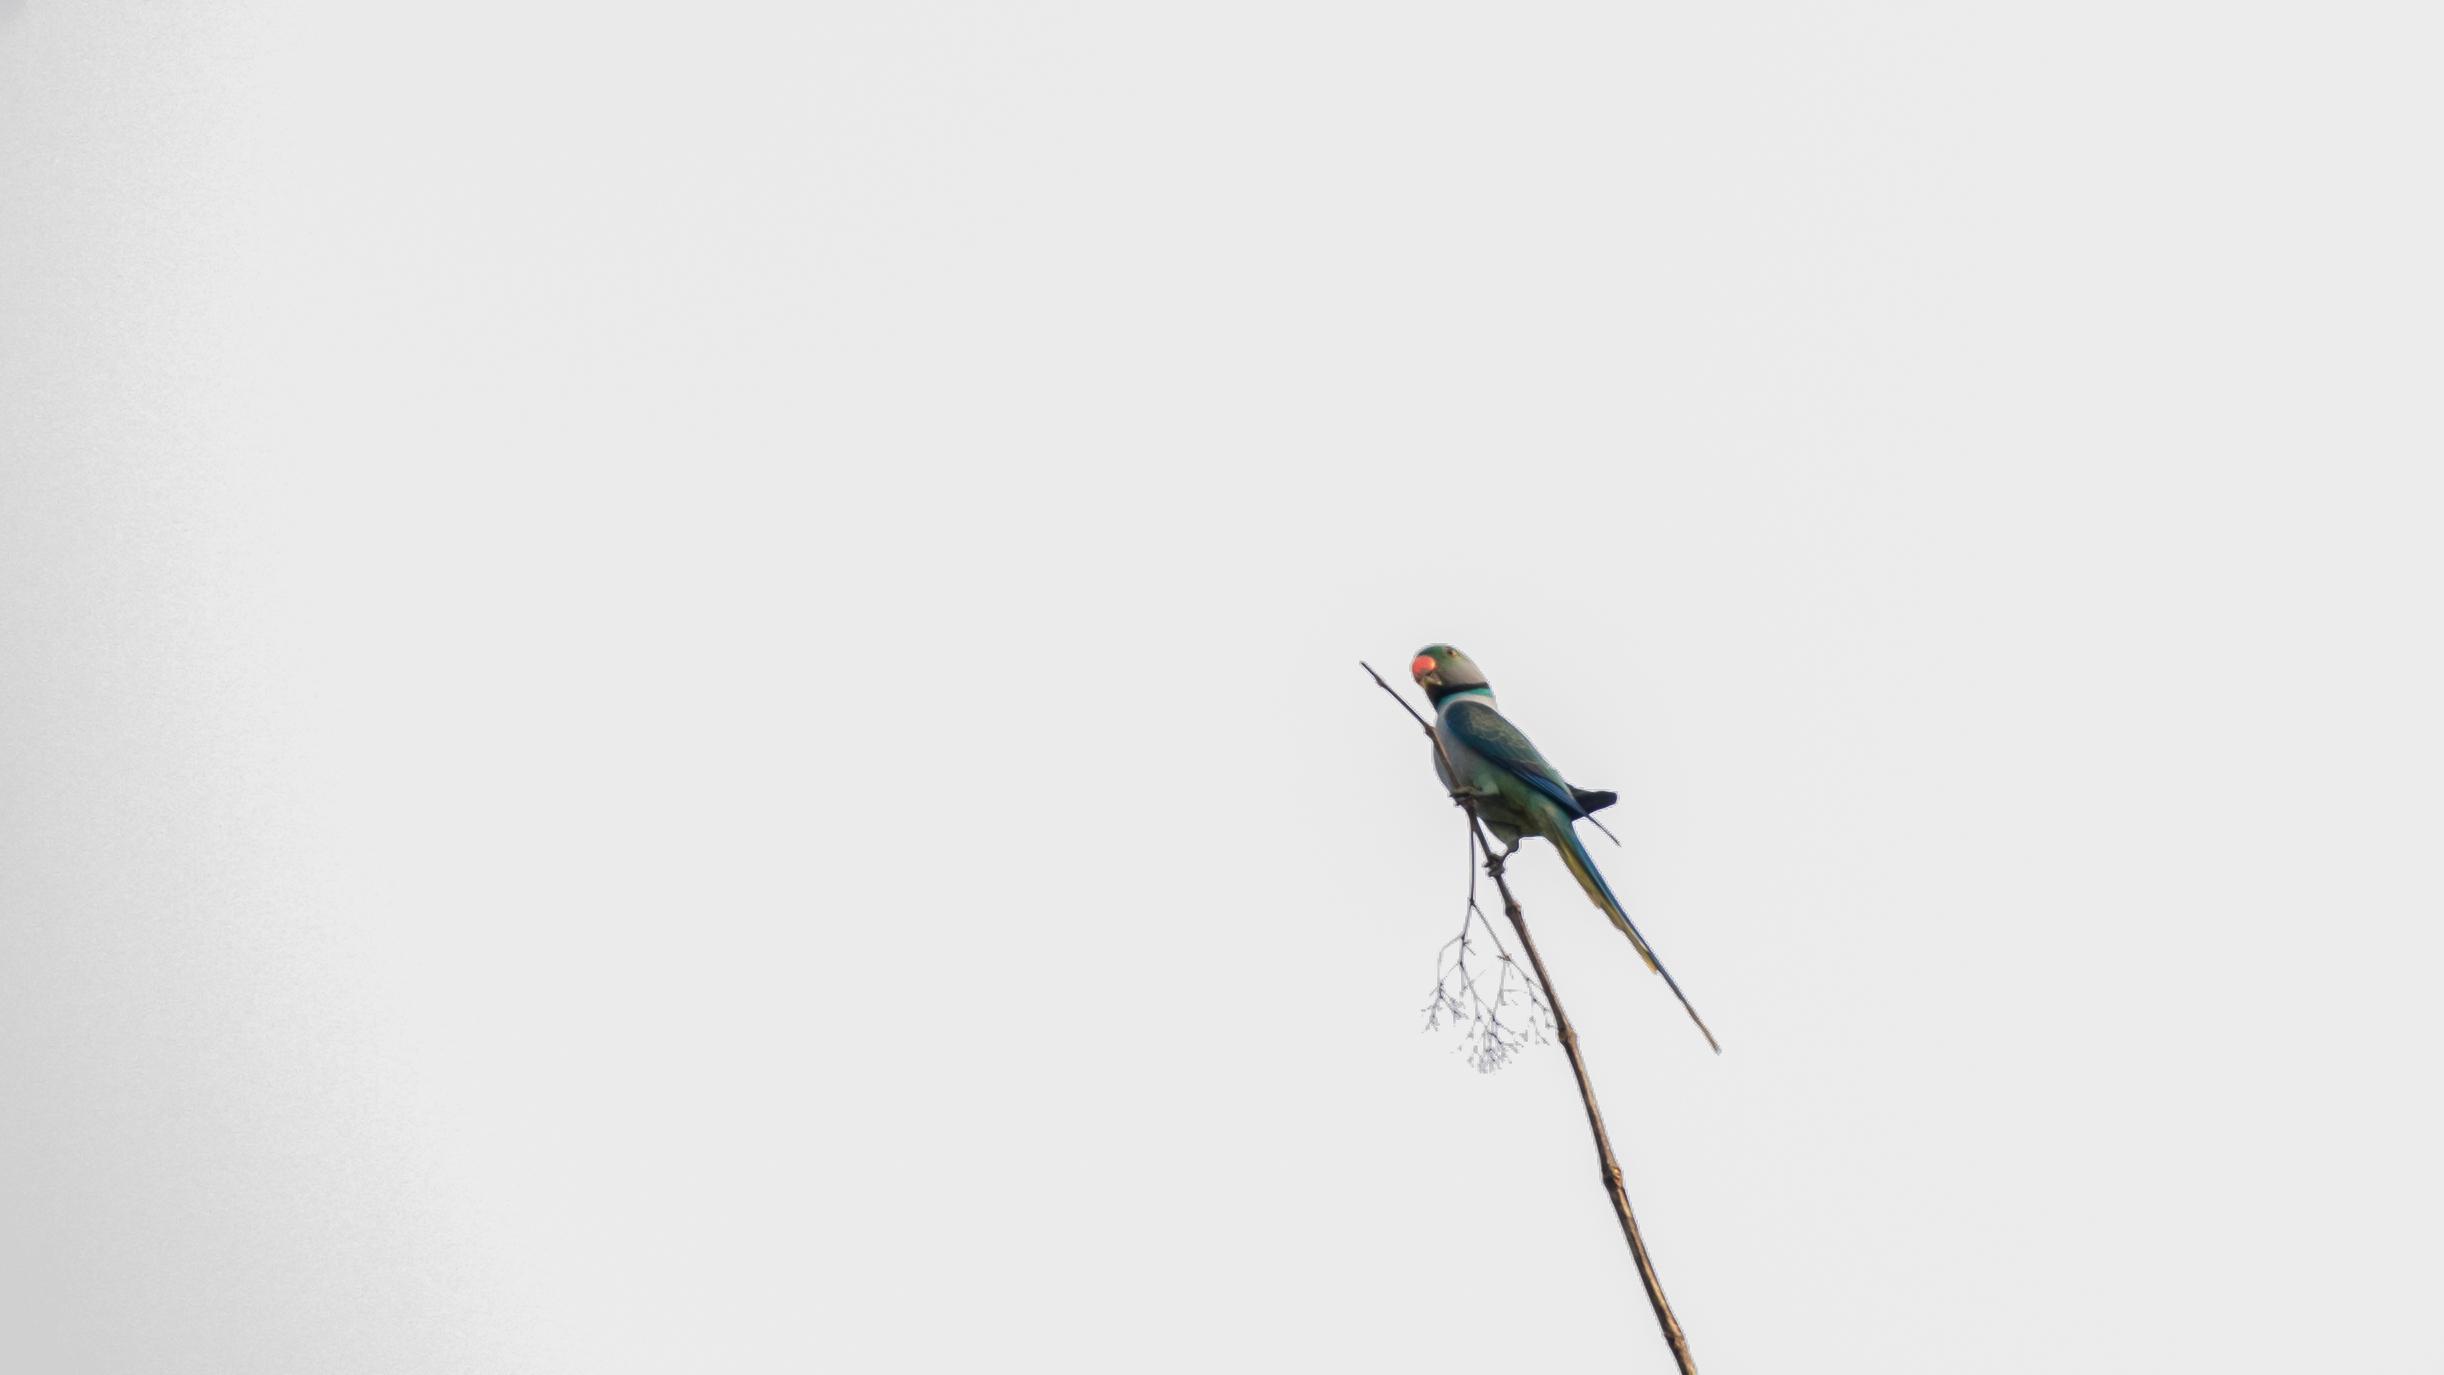 Malabar Parakeet (Psittacula columboides) in Thattekad Bird Sanctuary, Kerala, India. February 2015.Not baited. Not called in.